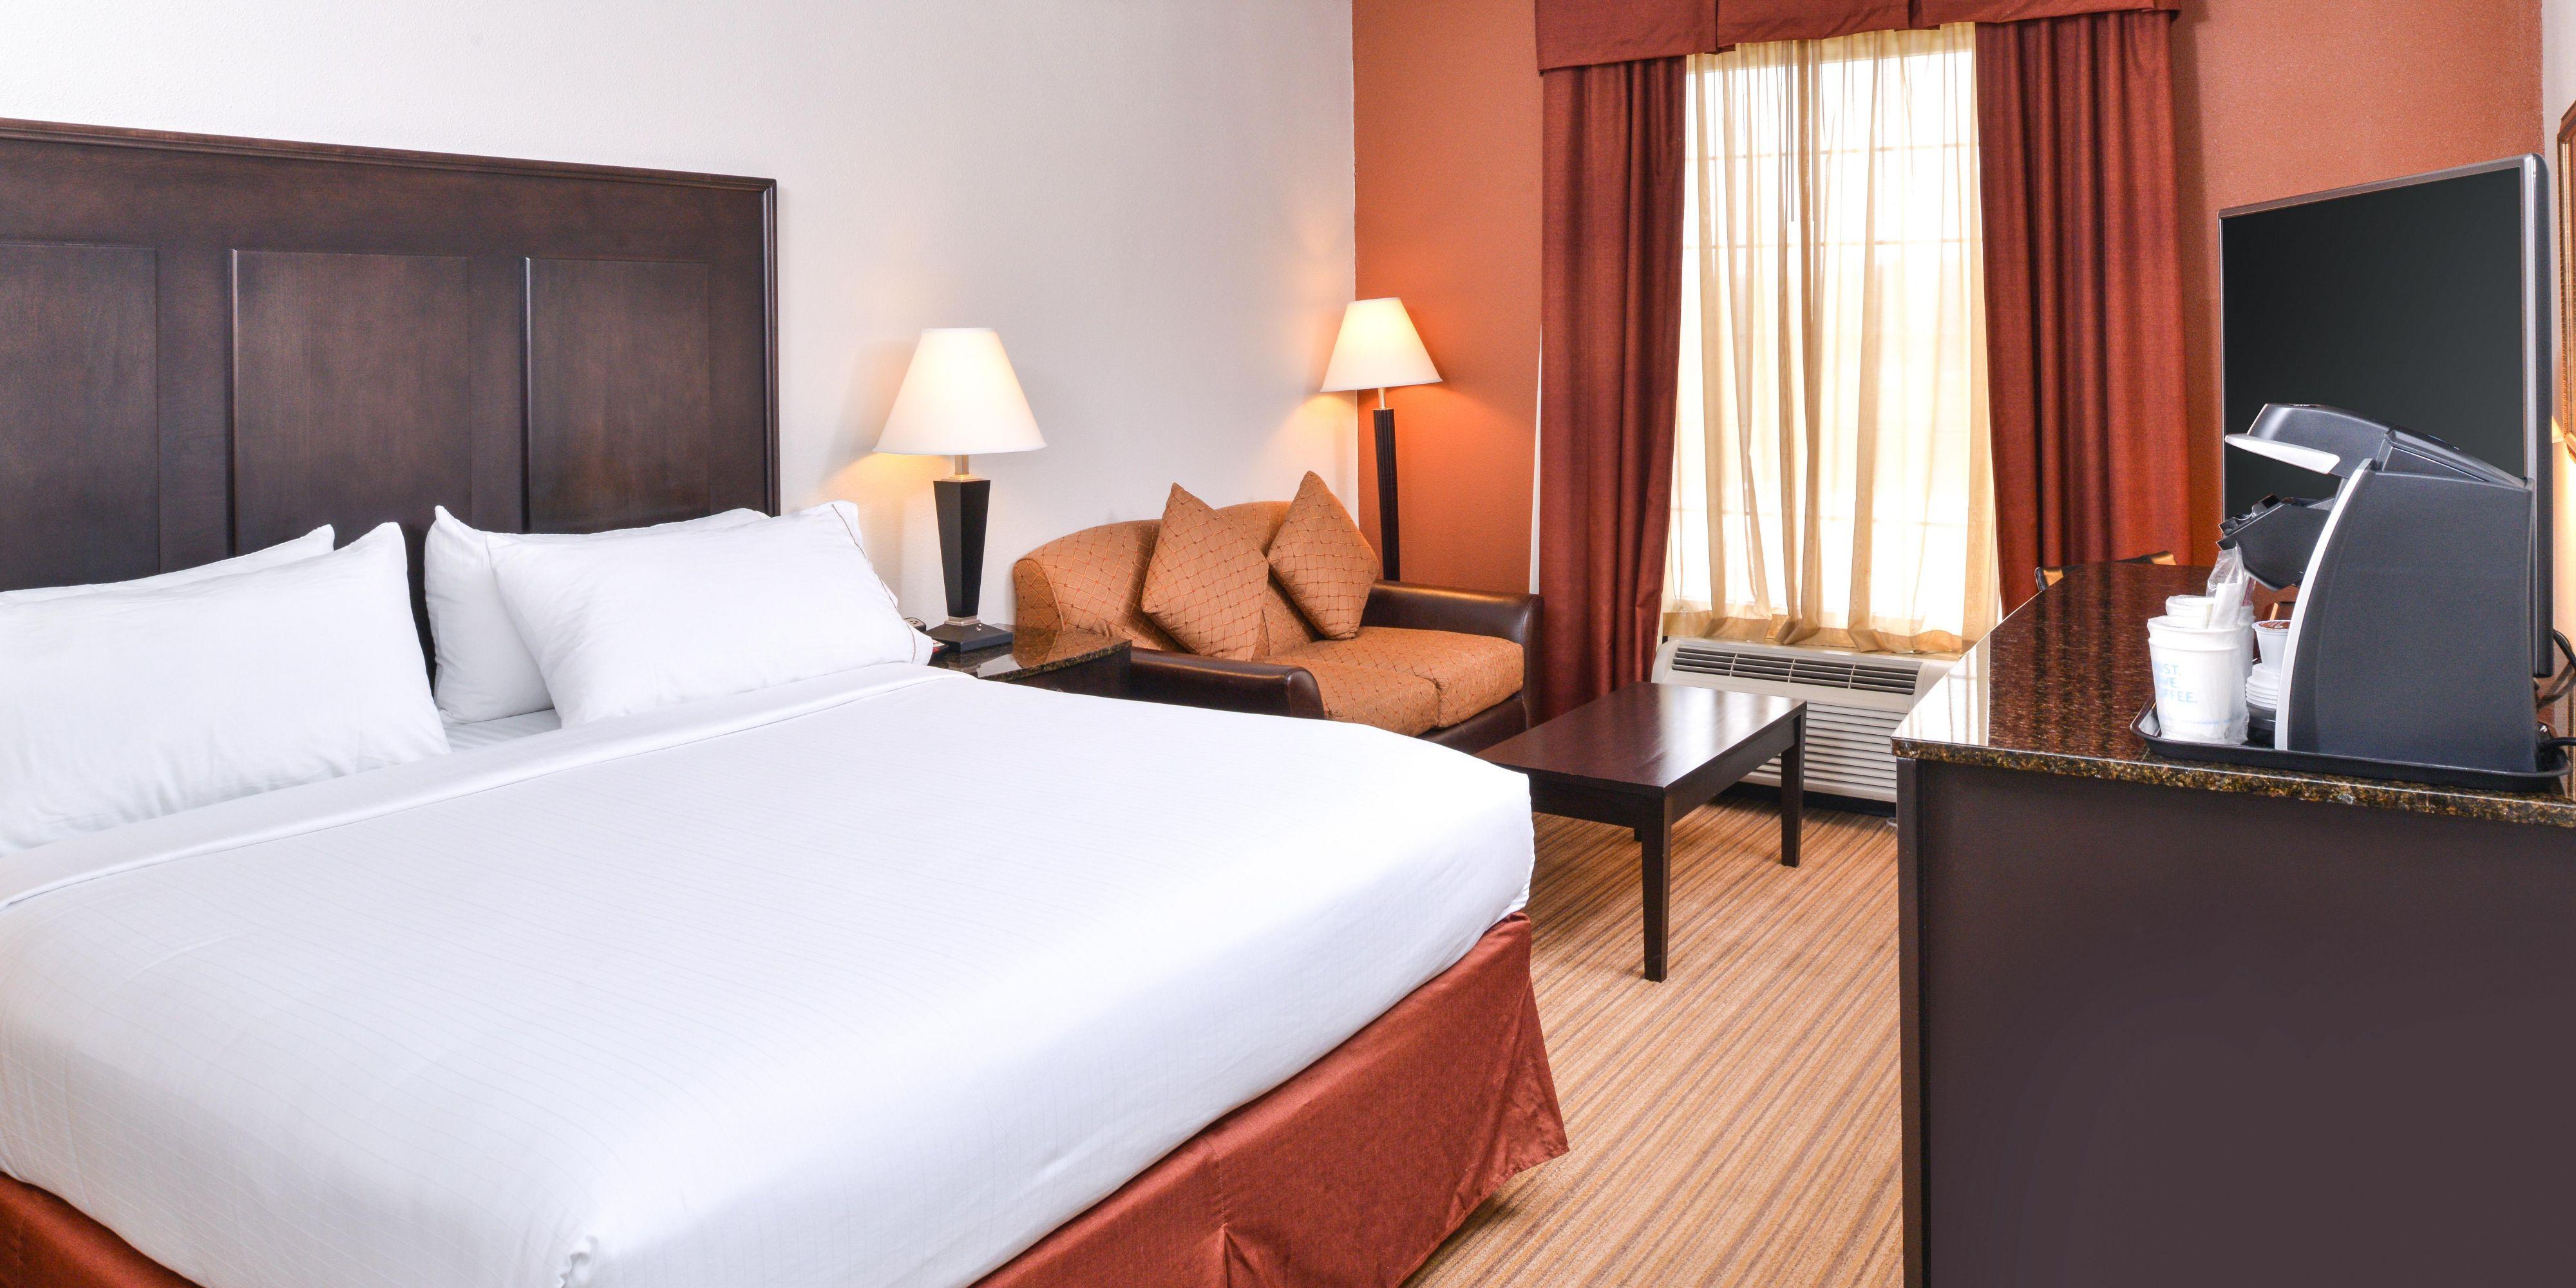 Holiday Inn Express Winston-Salem Downtown West Hotel by IHG